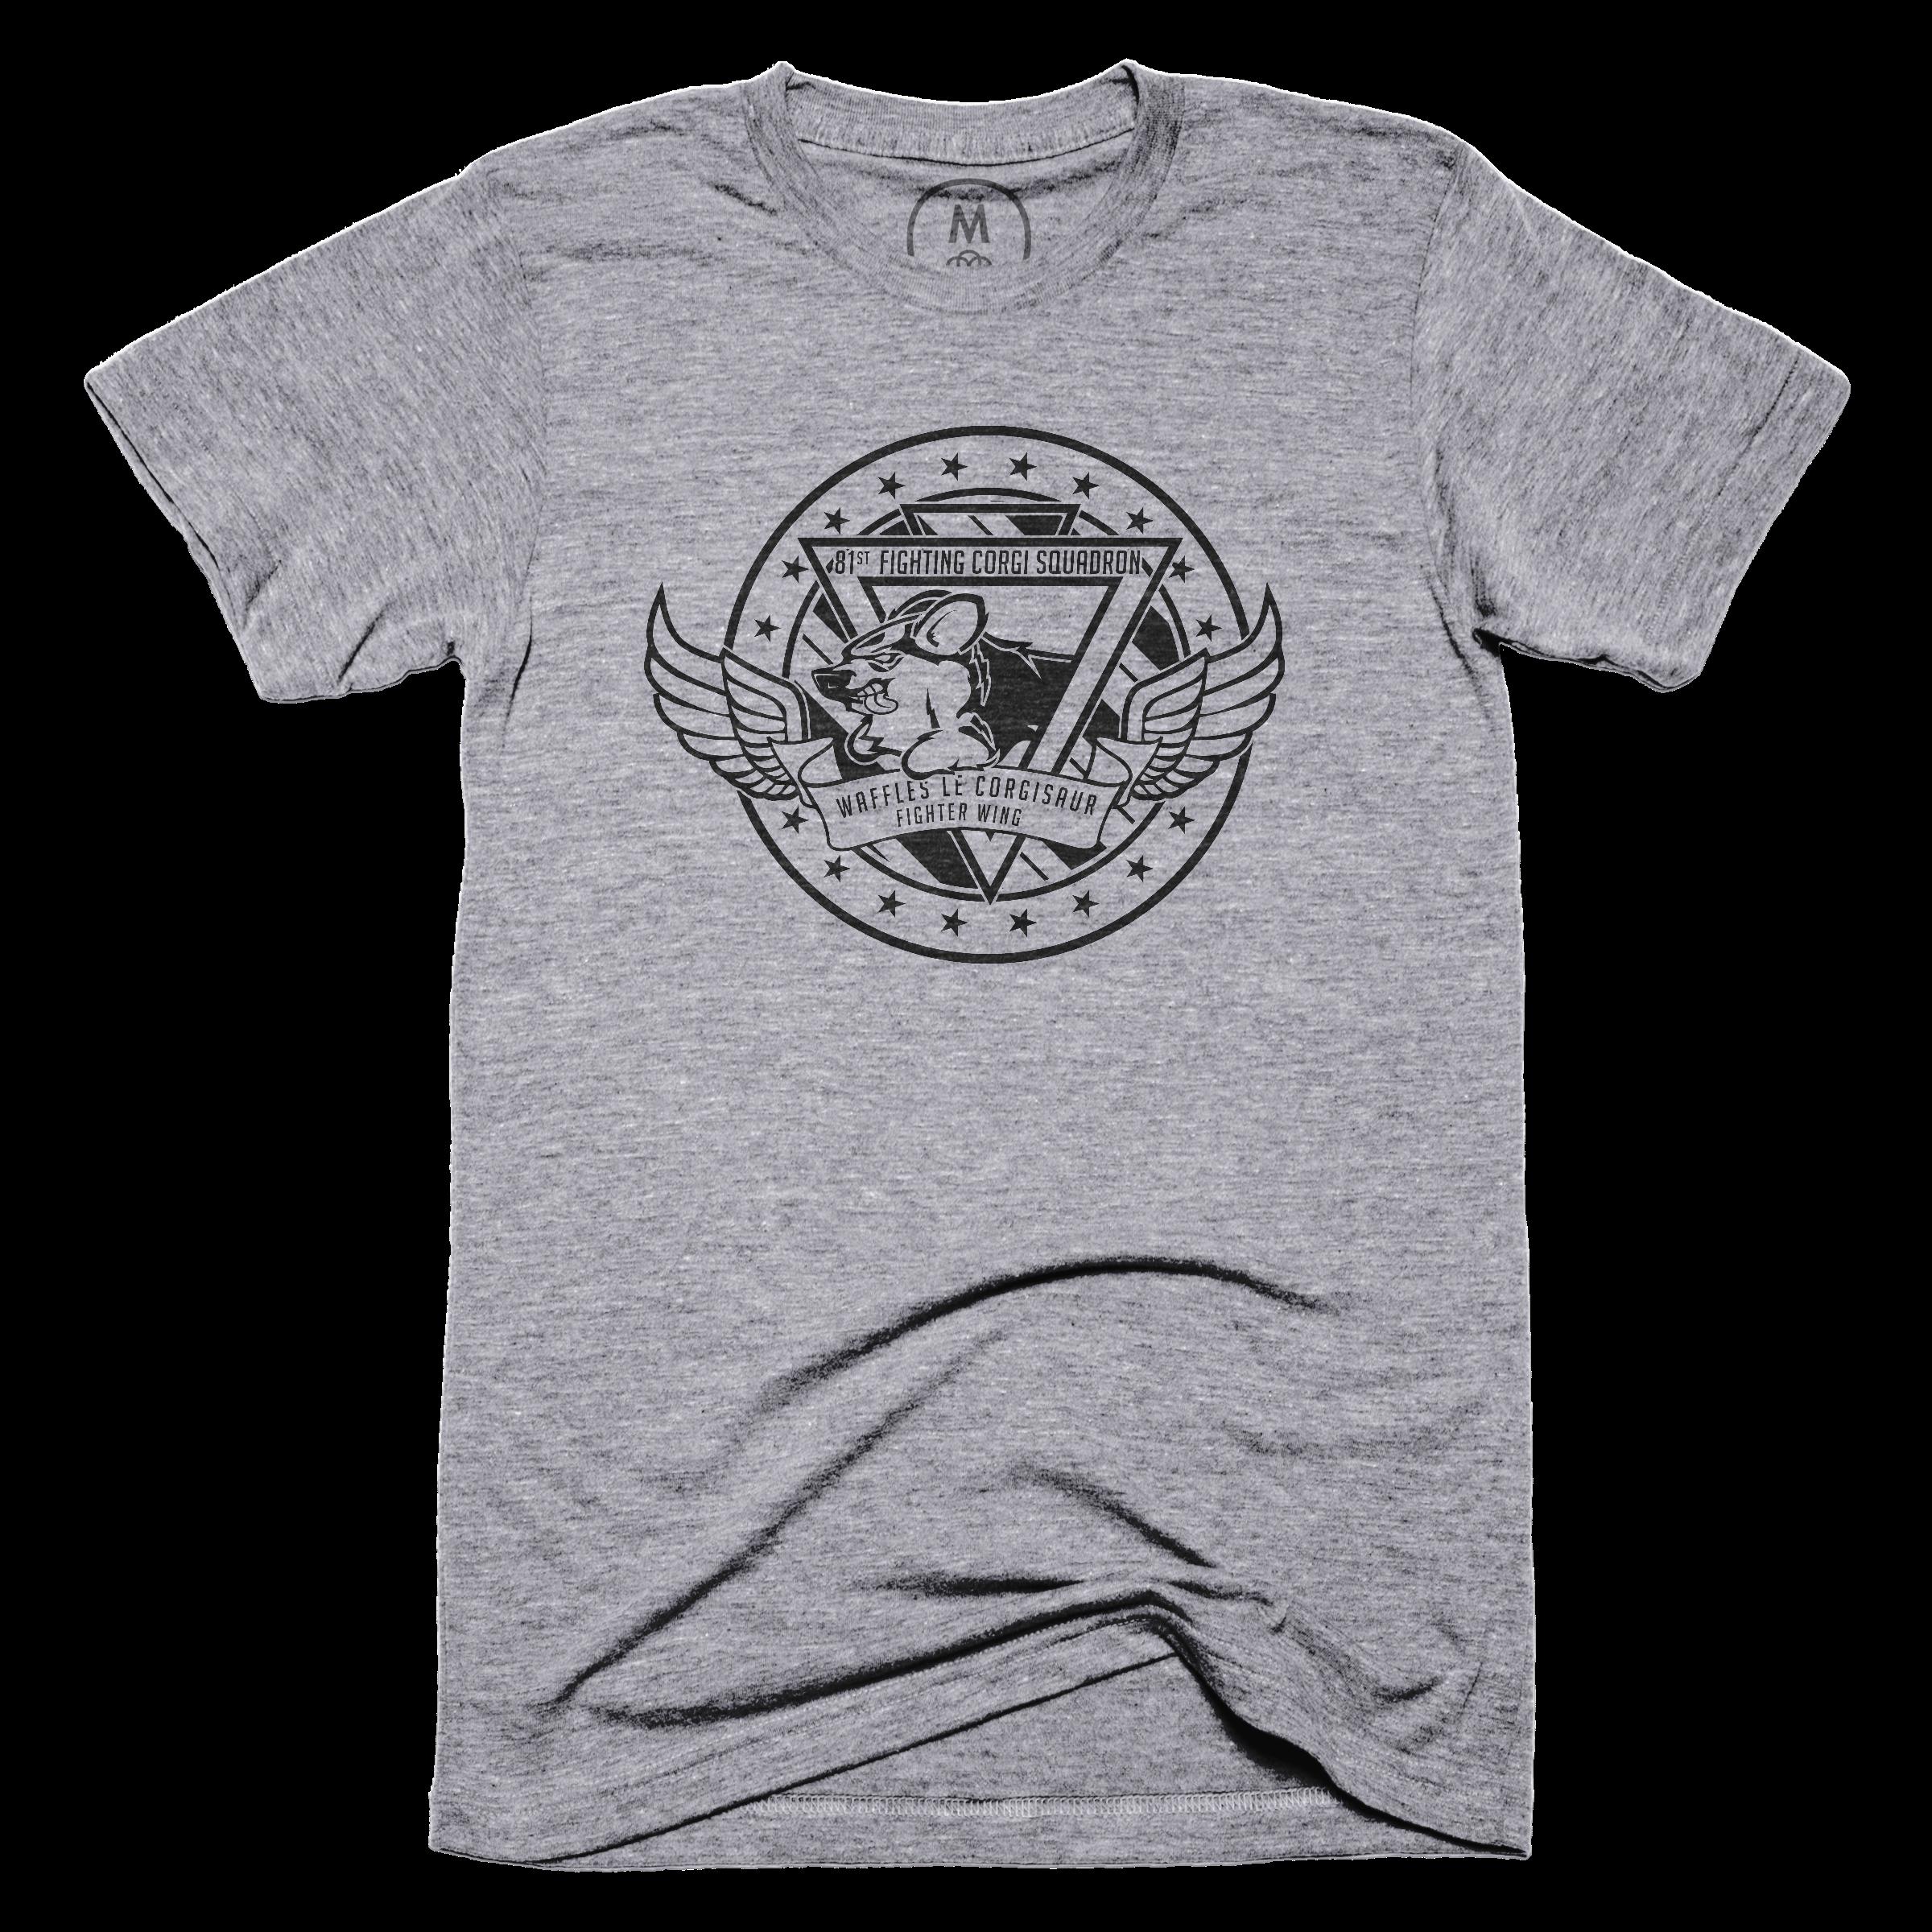 81st Fighting Corgi Squadron